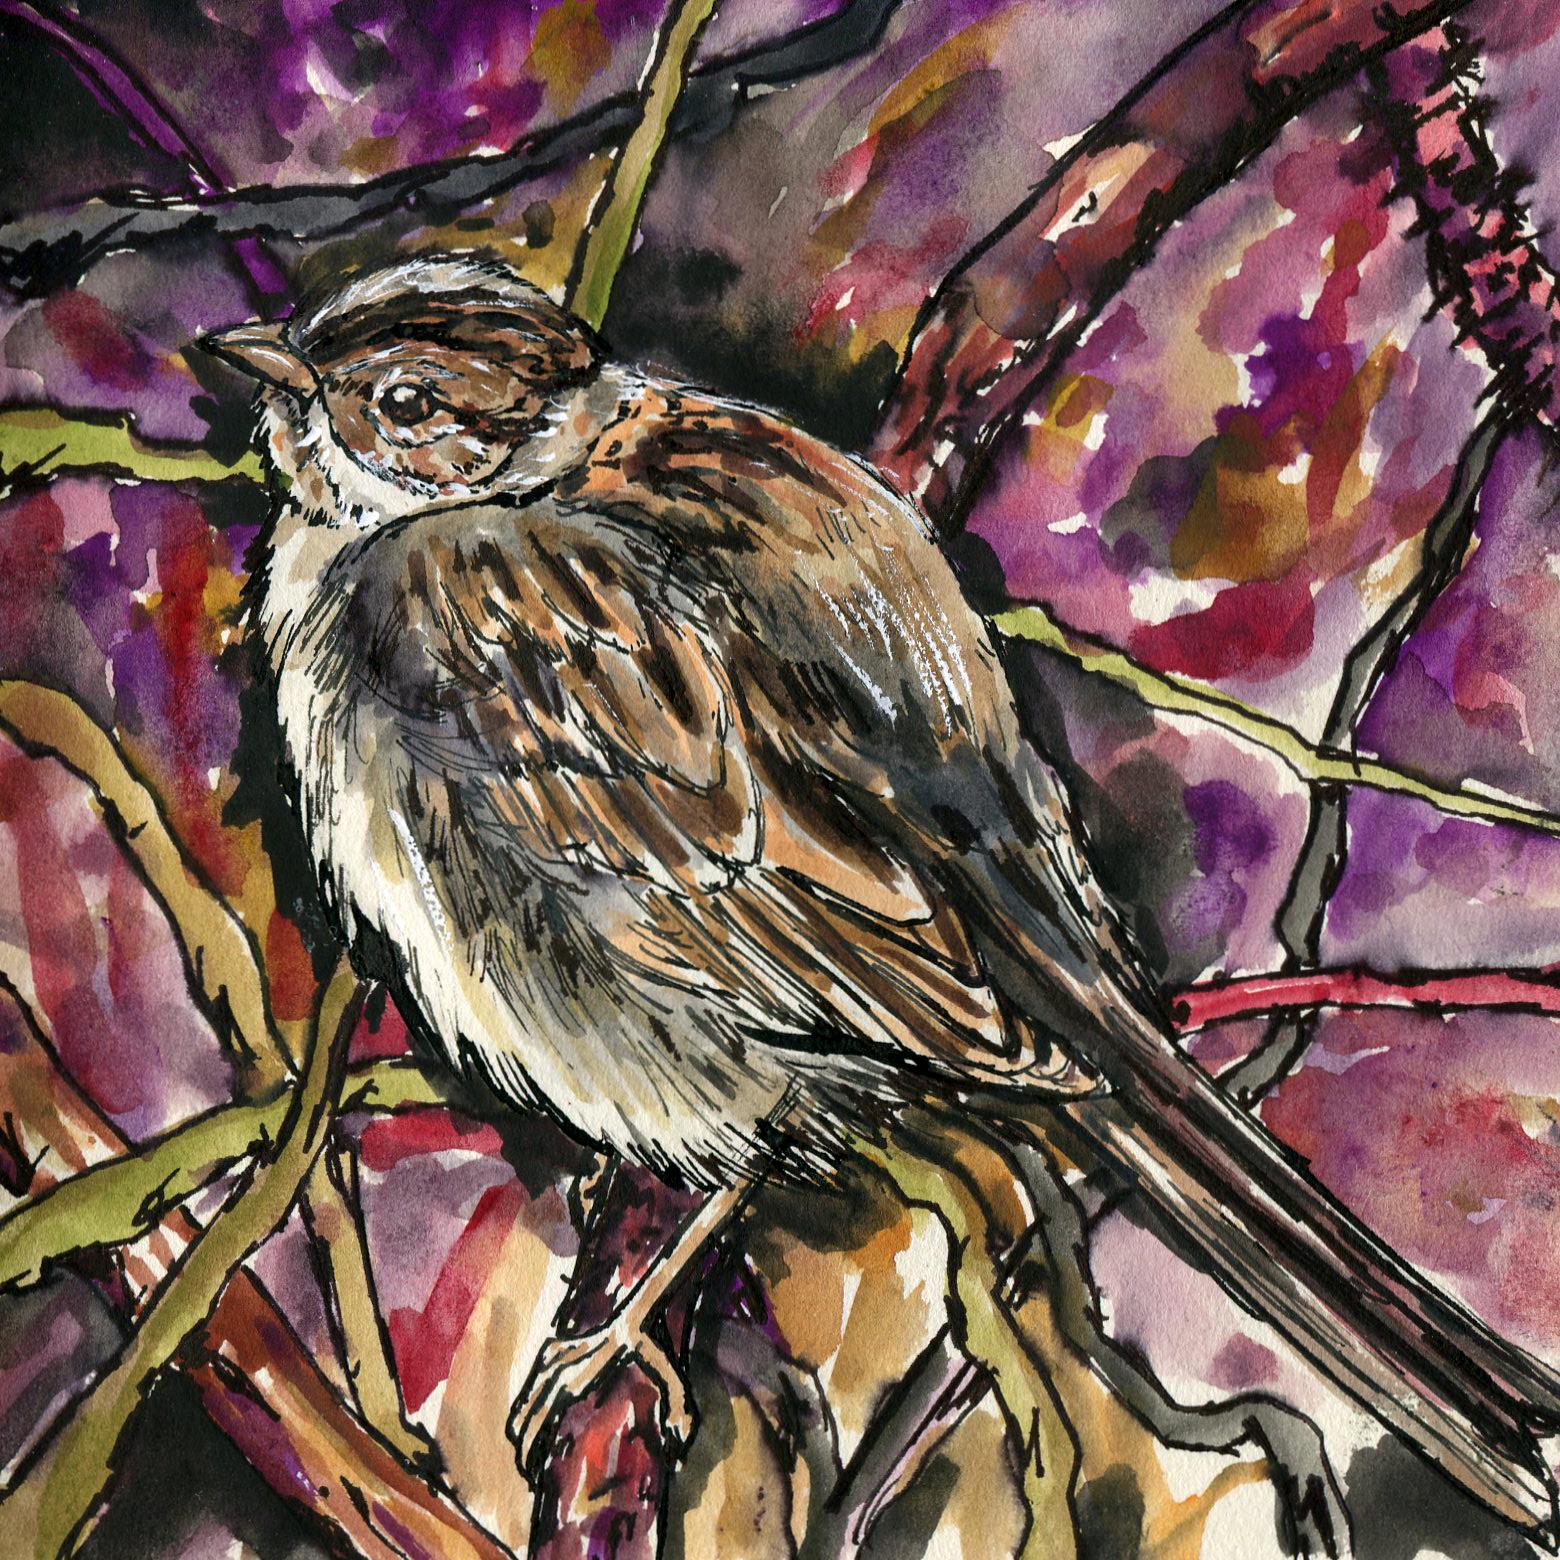 93. Clay-colored Sparrow